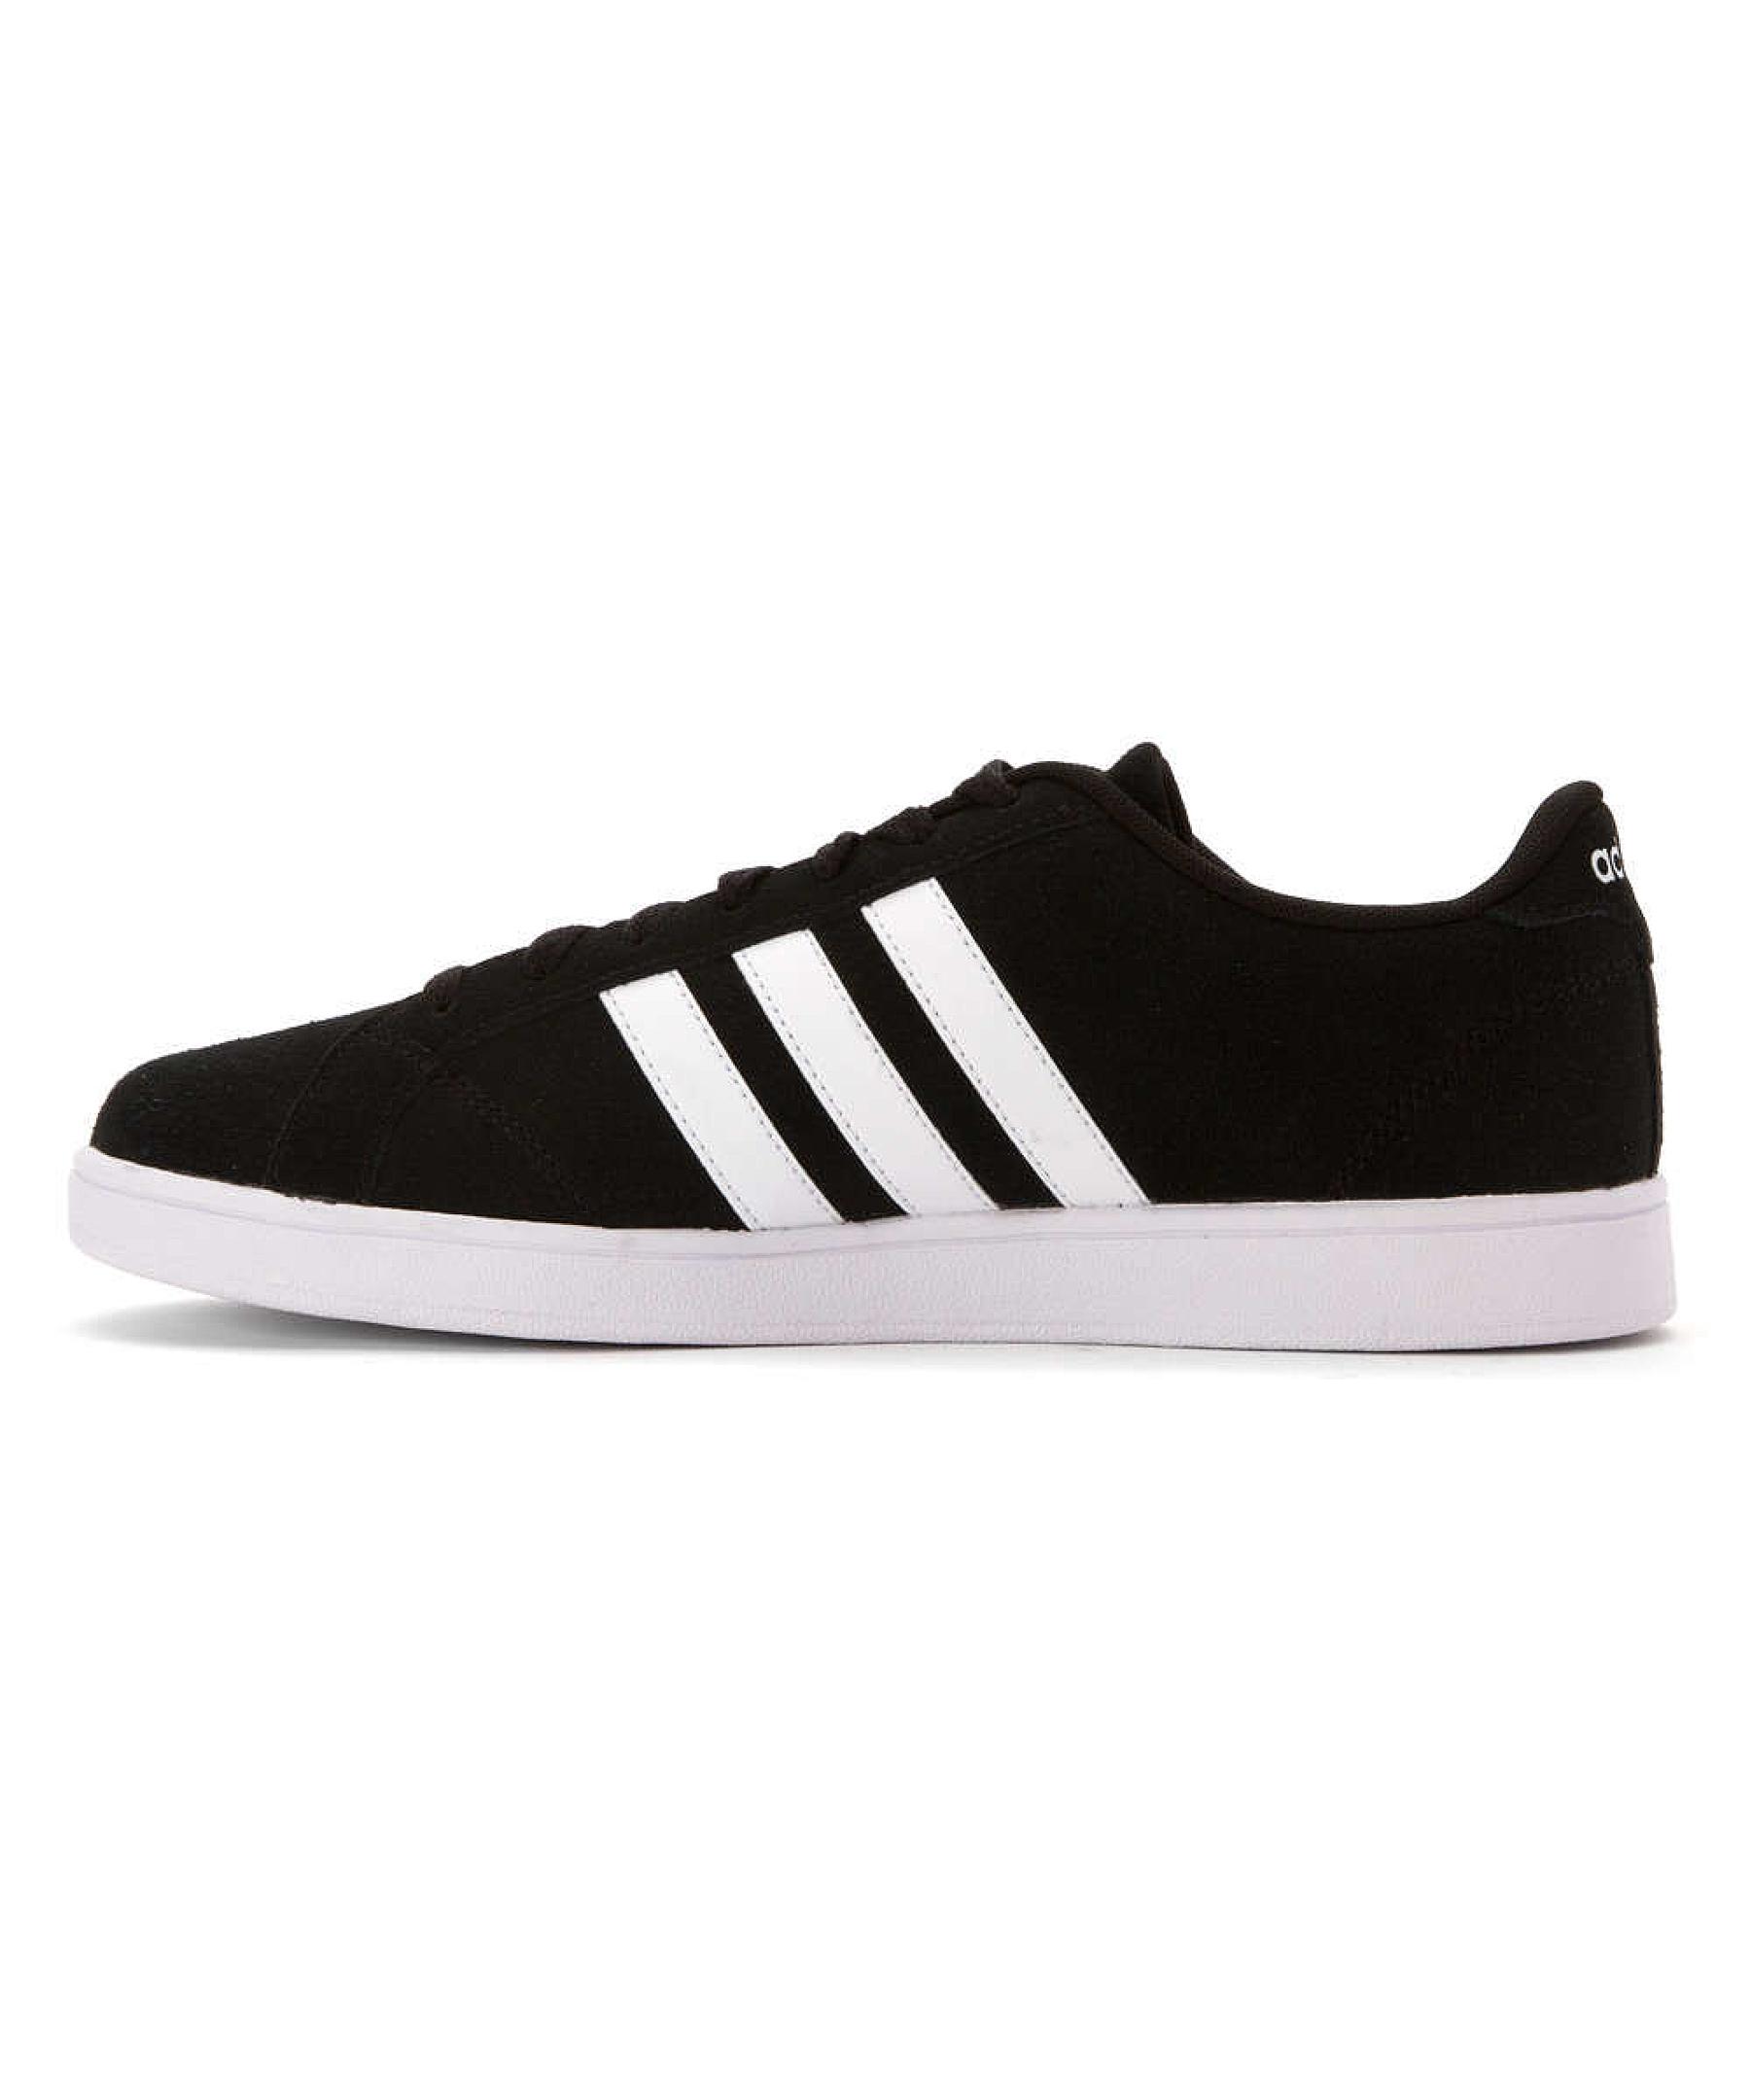 Baseline Sneakers Men S Fashion